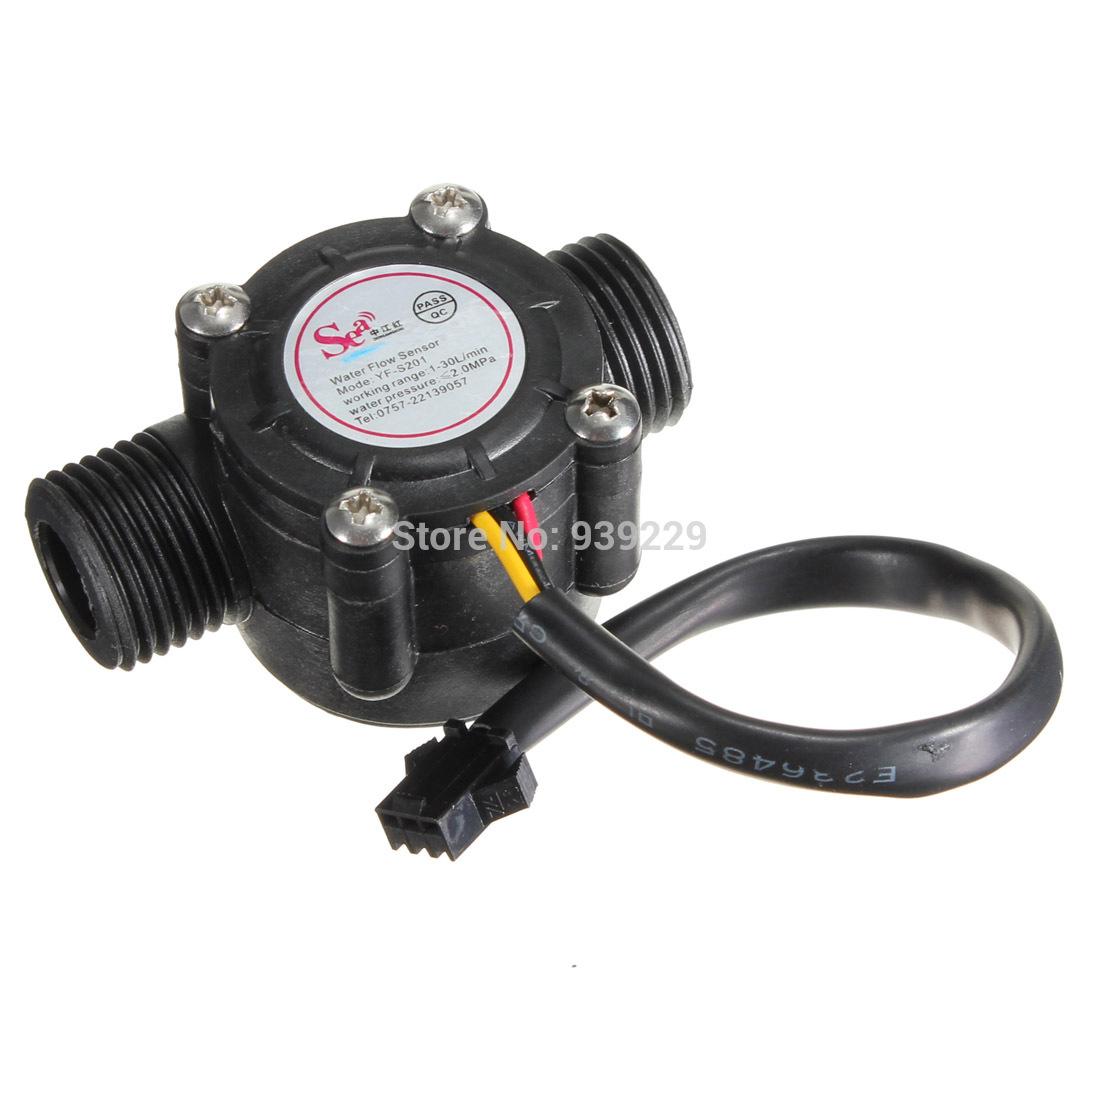 New Water Flow Sensor Switch Meter Flowmeter Hall Flow Counter Sensor Water Control 1 30L min